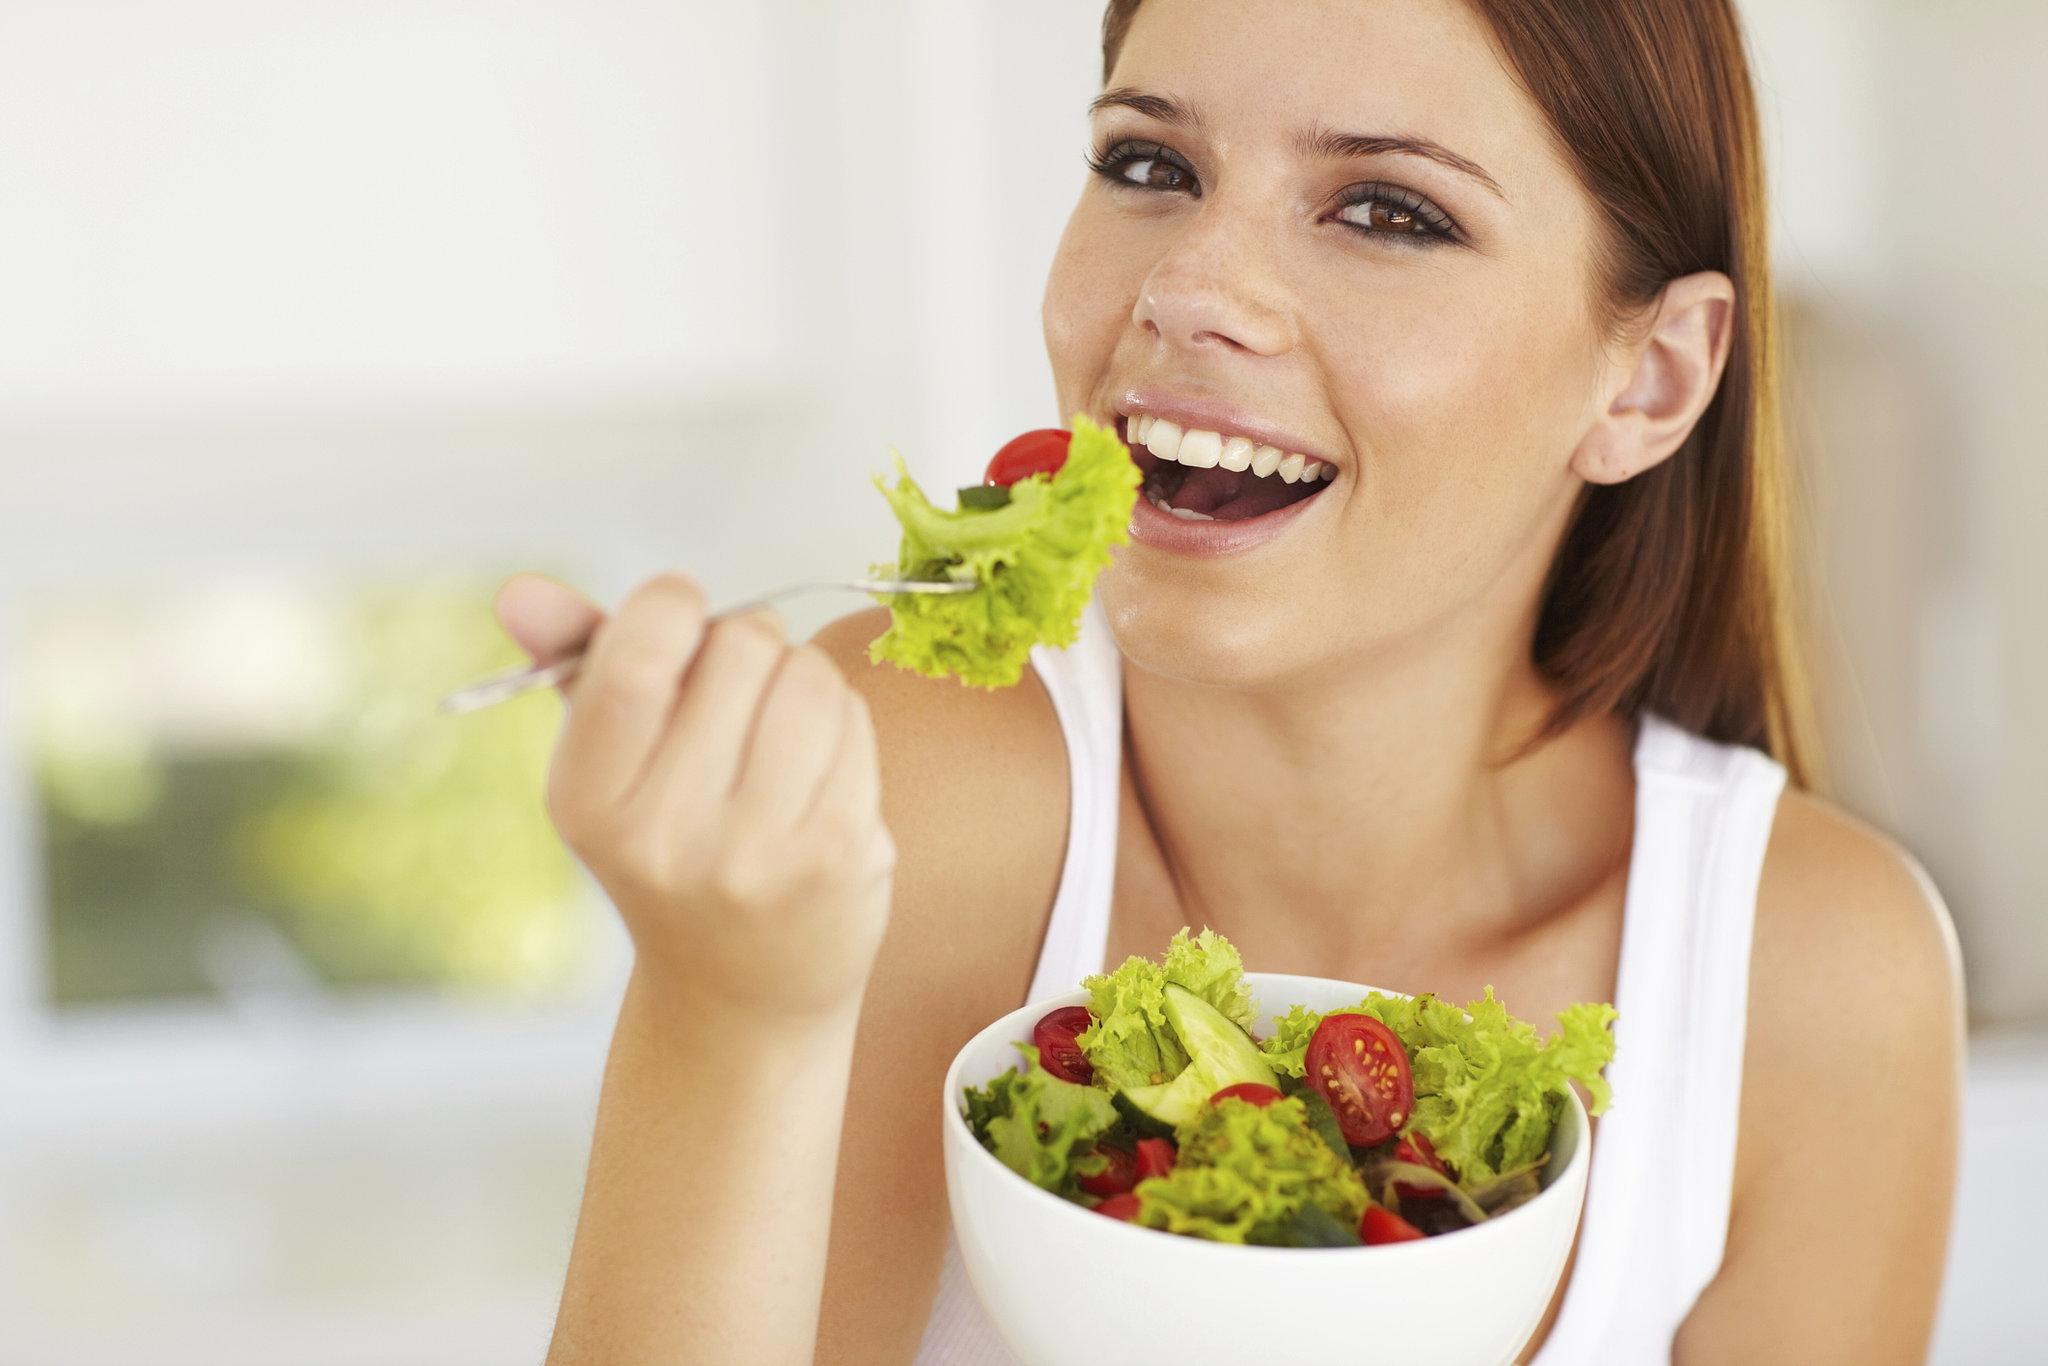 sonar-con-comer-ensaladas